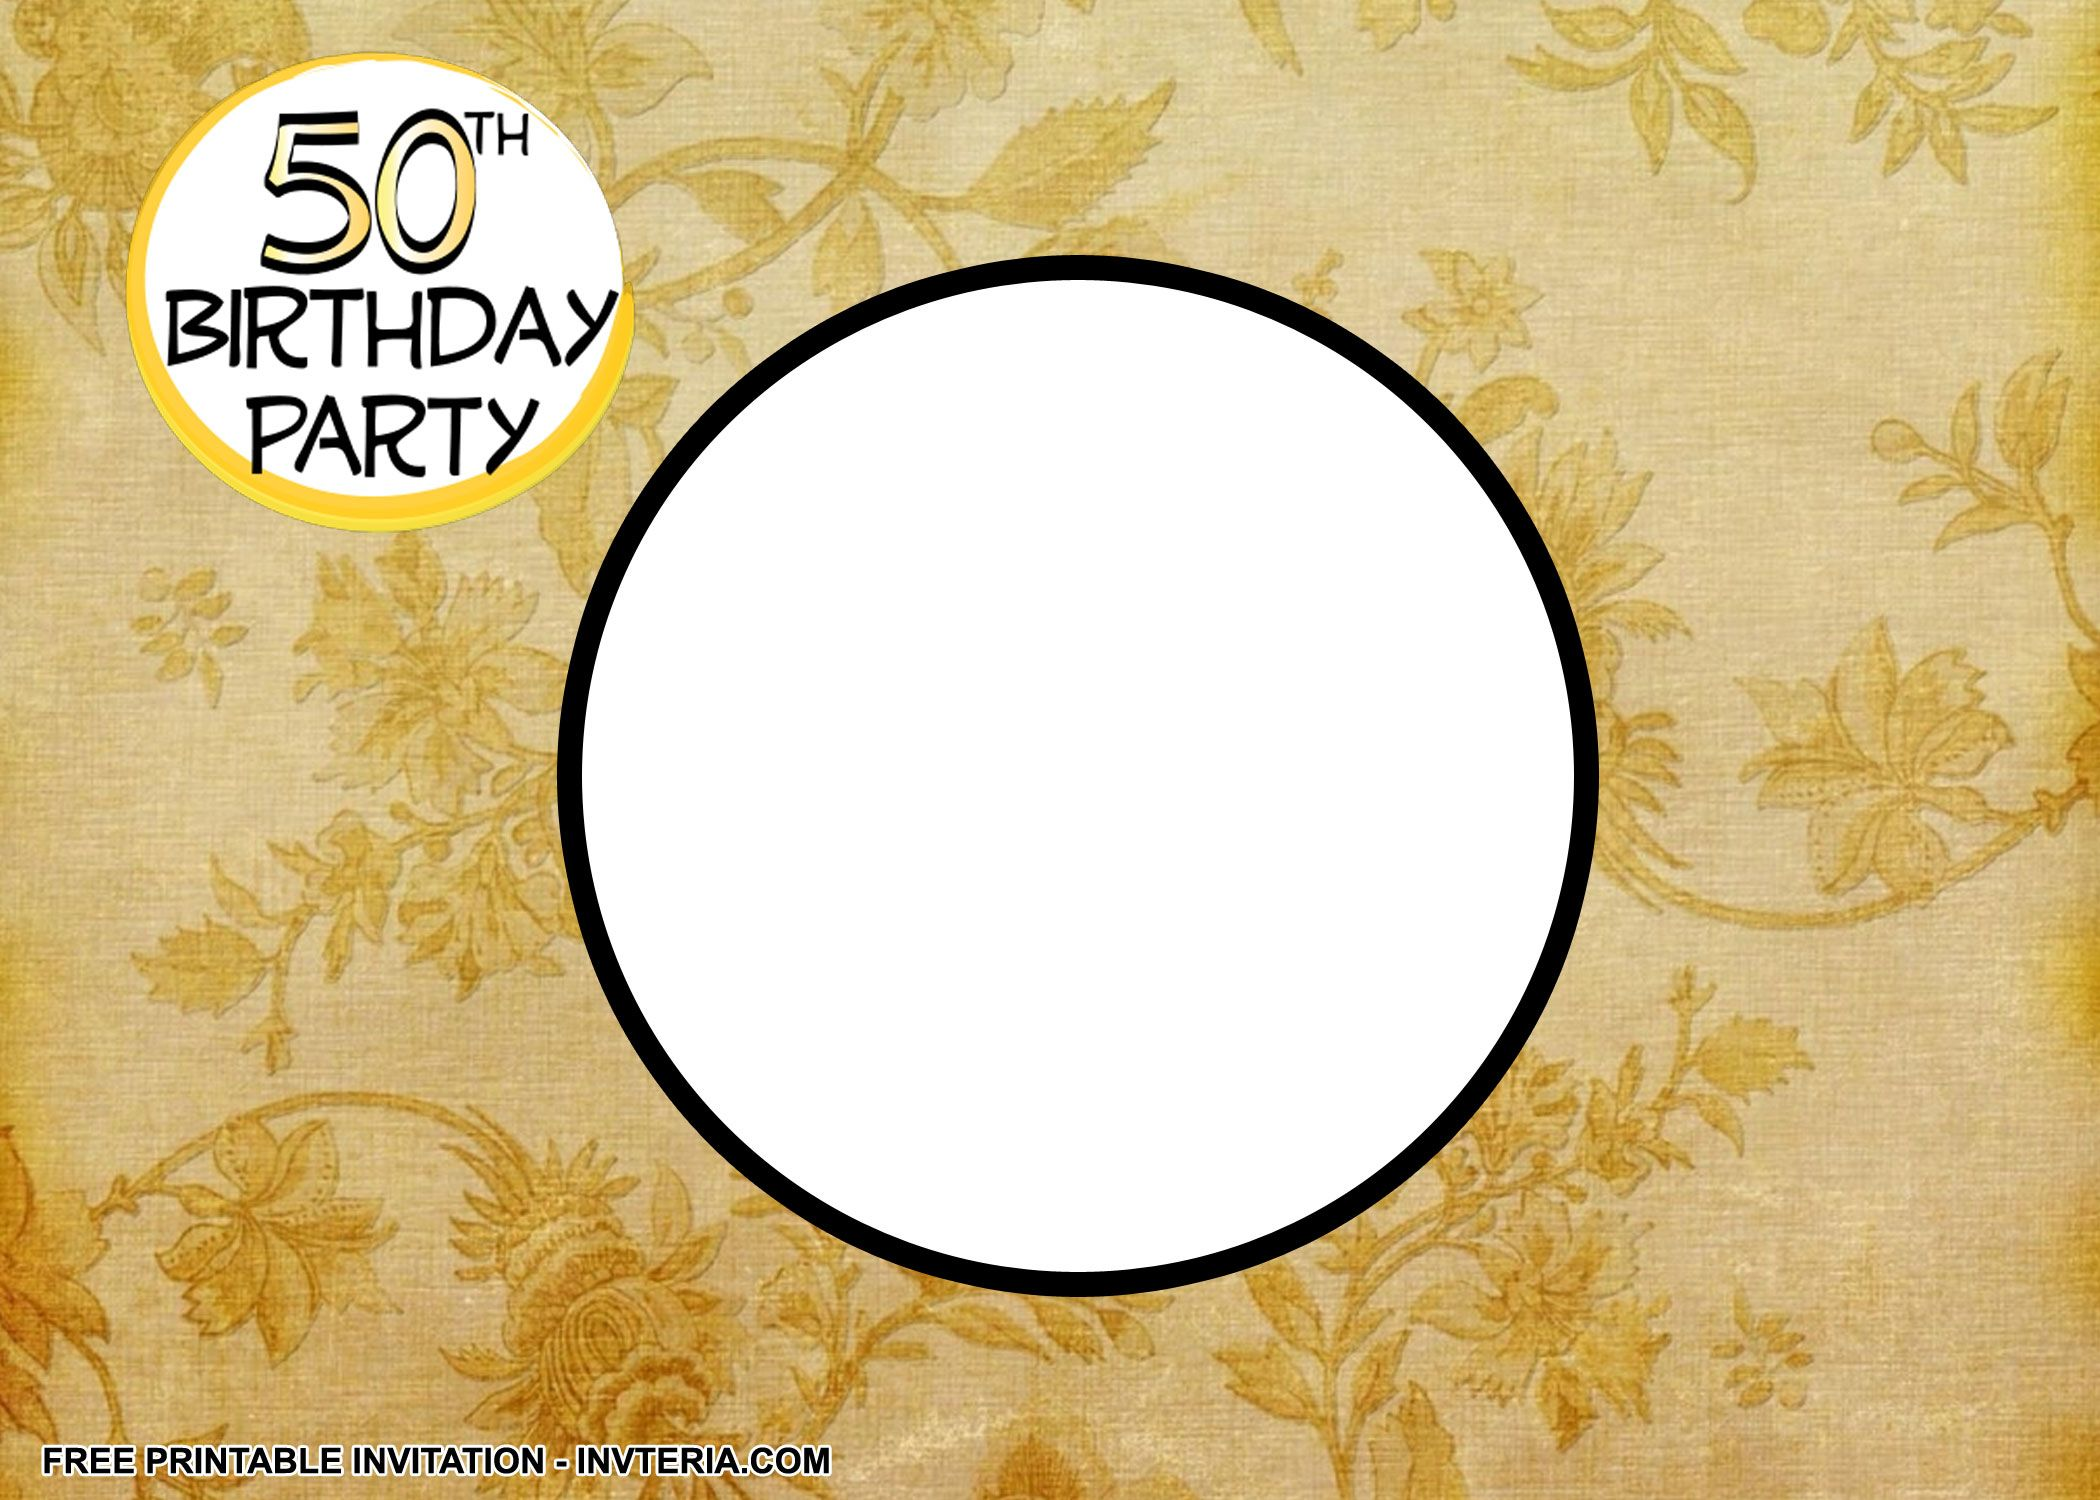 NICE BEST FREE PRINTABLE 50TH BIRTHDAY INVITATION WORDING IDEA ...